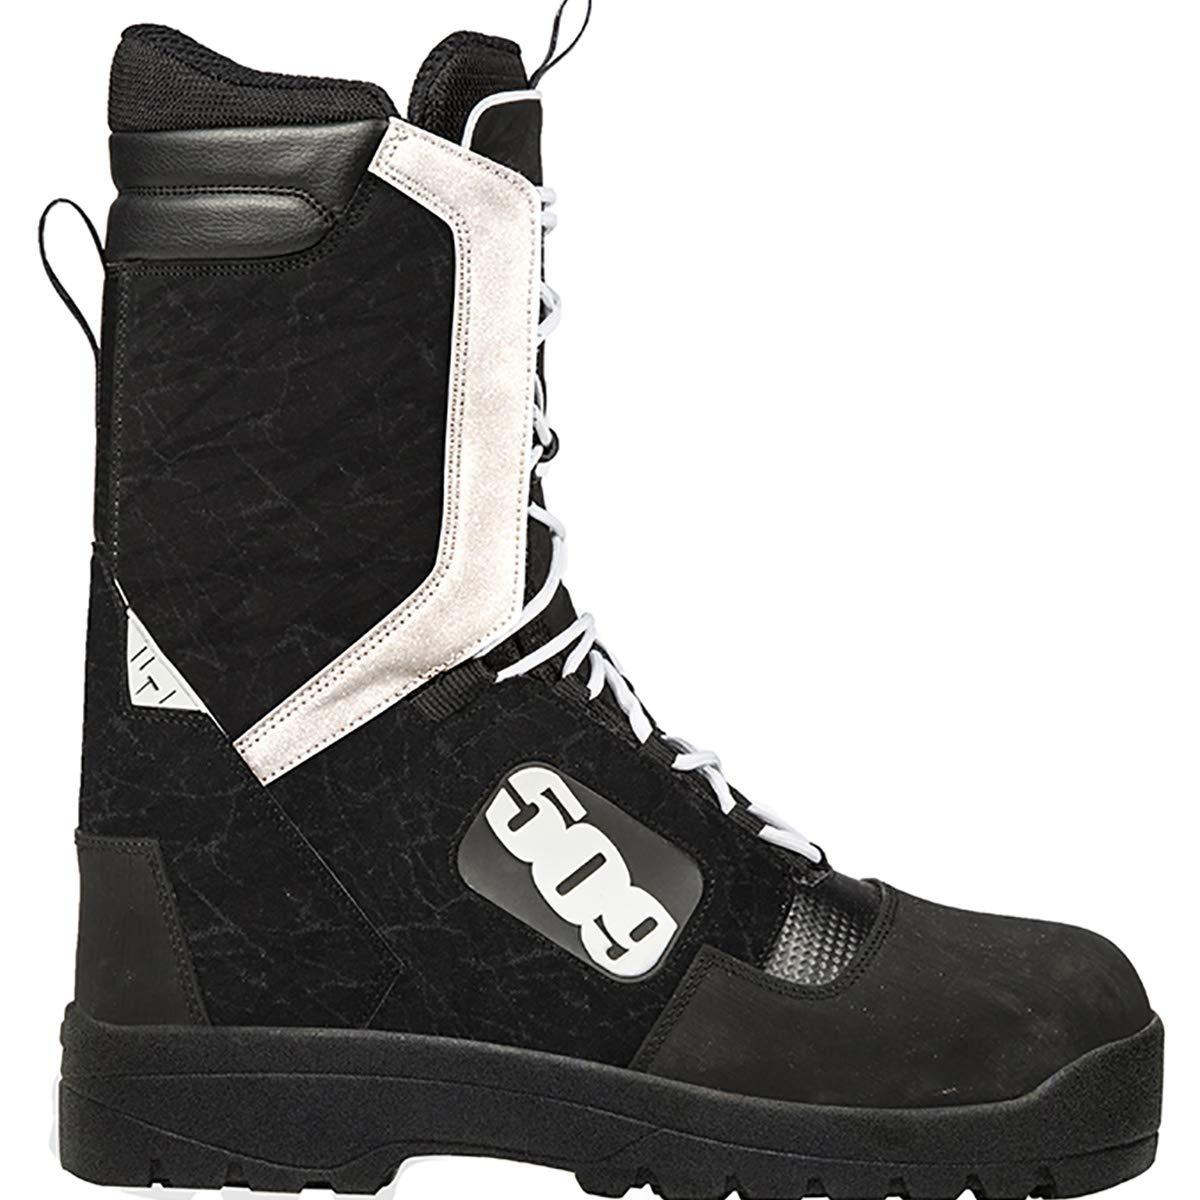 509 Raid Laced Boot (Black/White - 11) F06000200-011-001